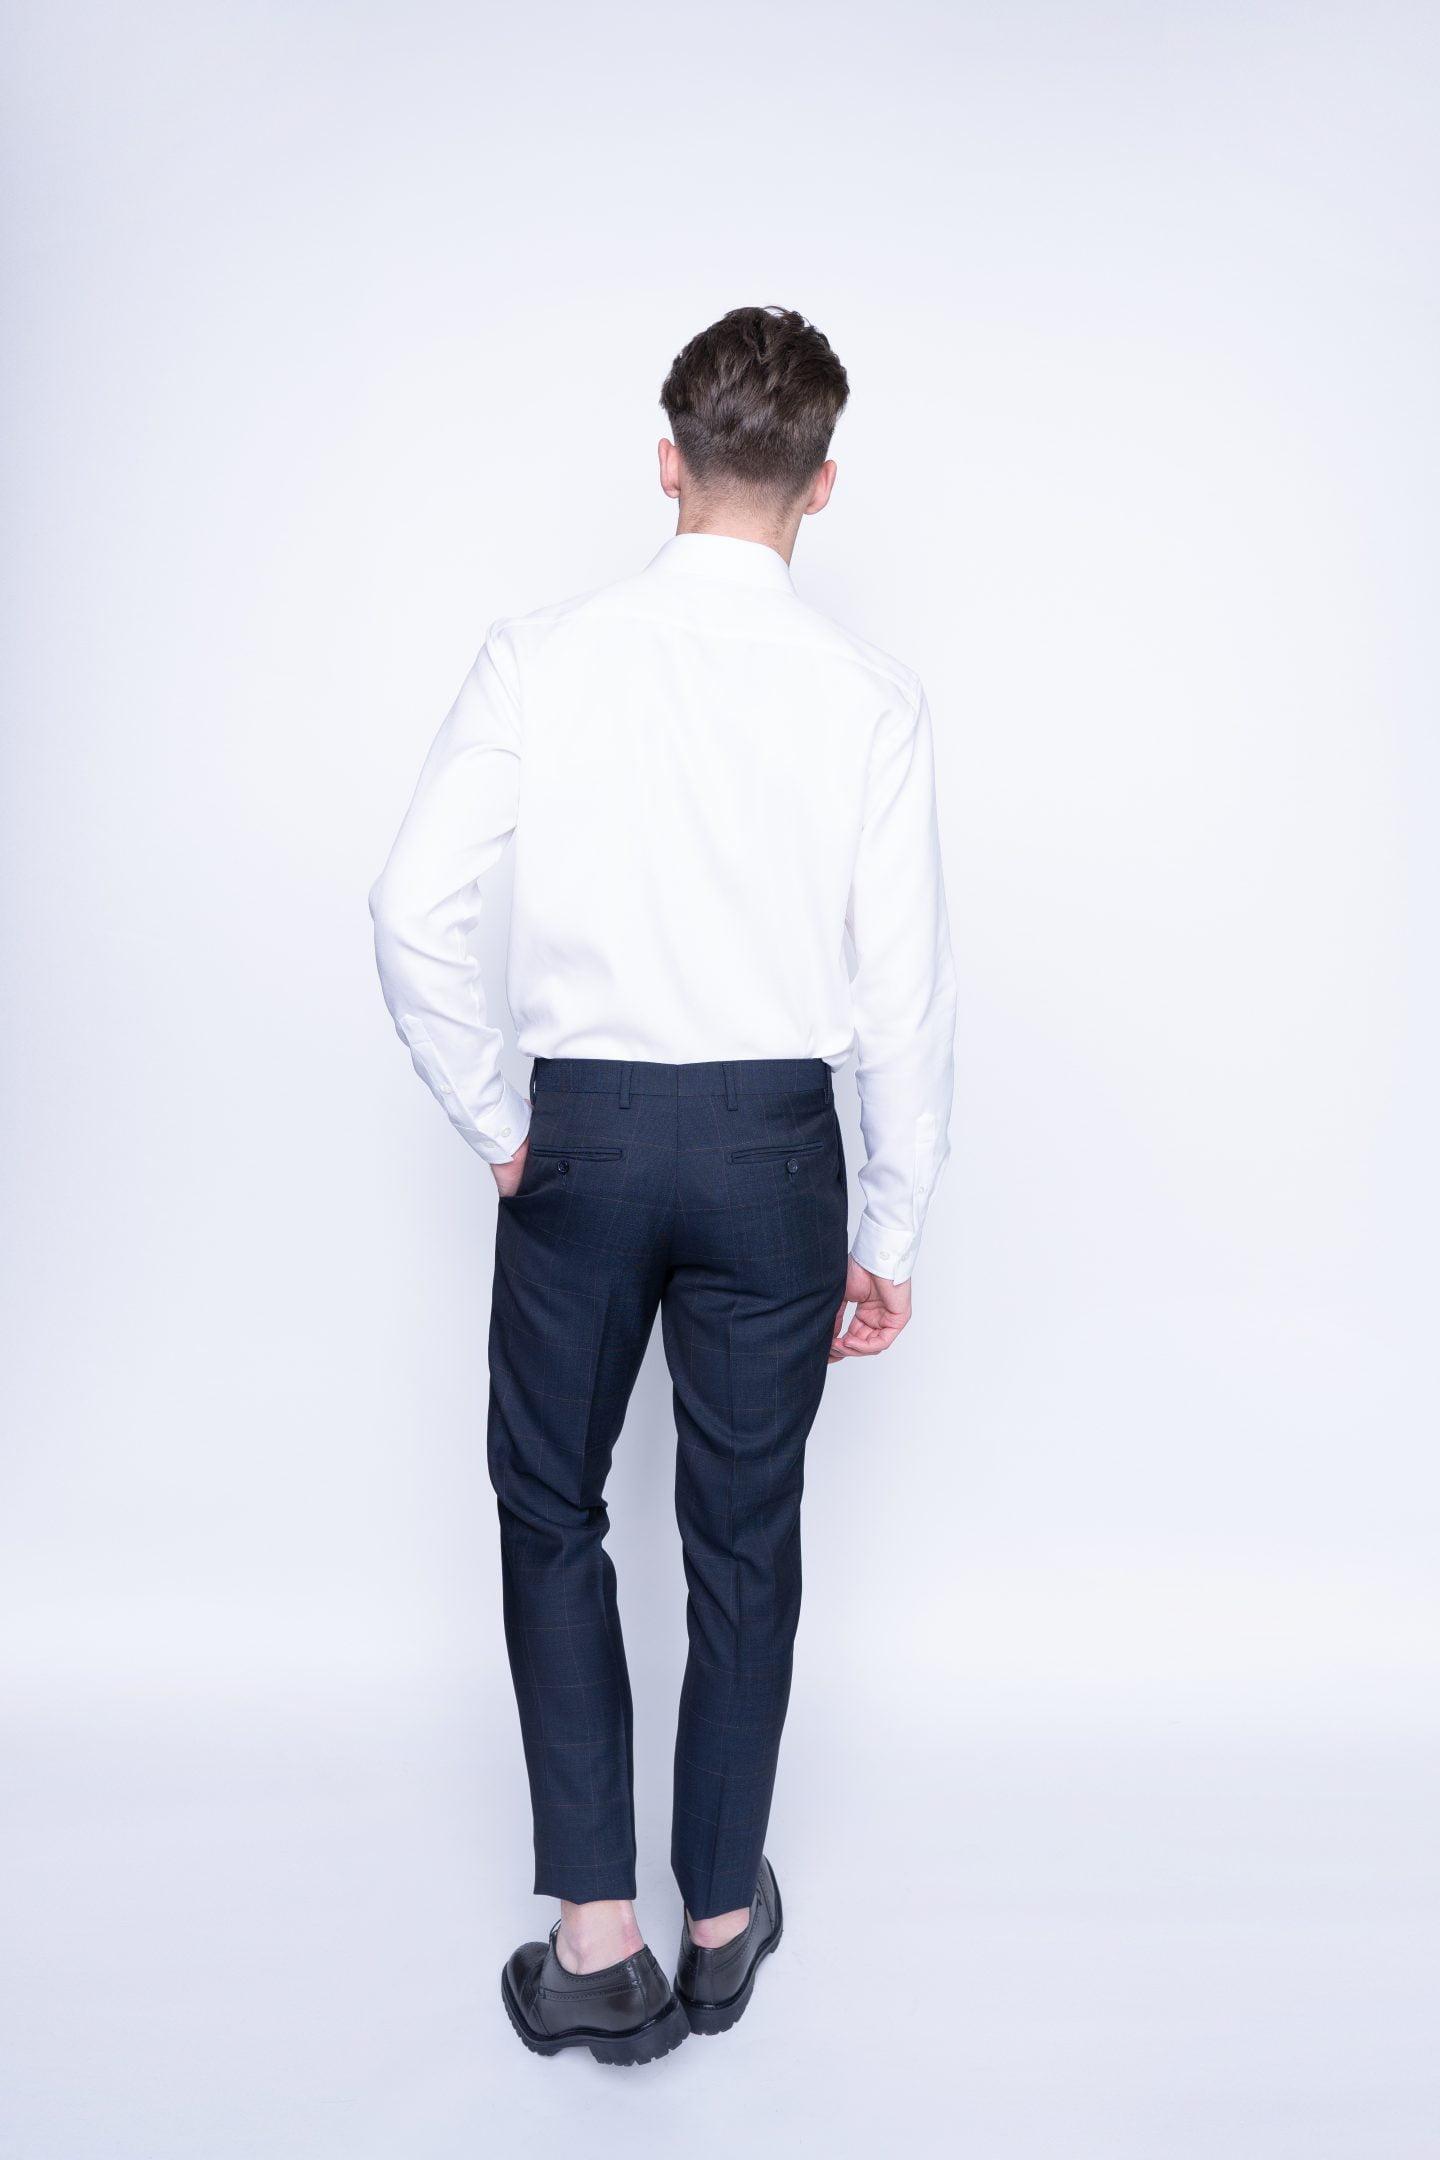 pilkos languotos kelnės